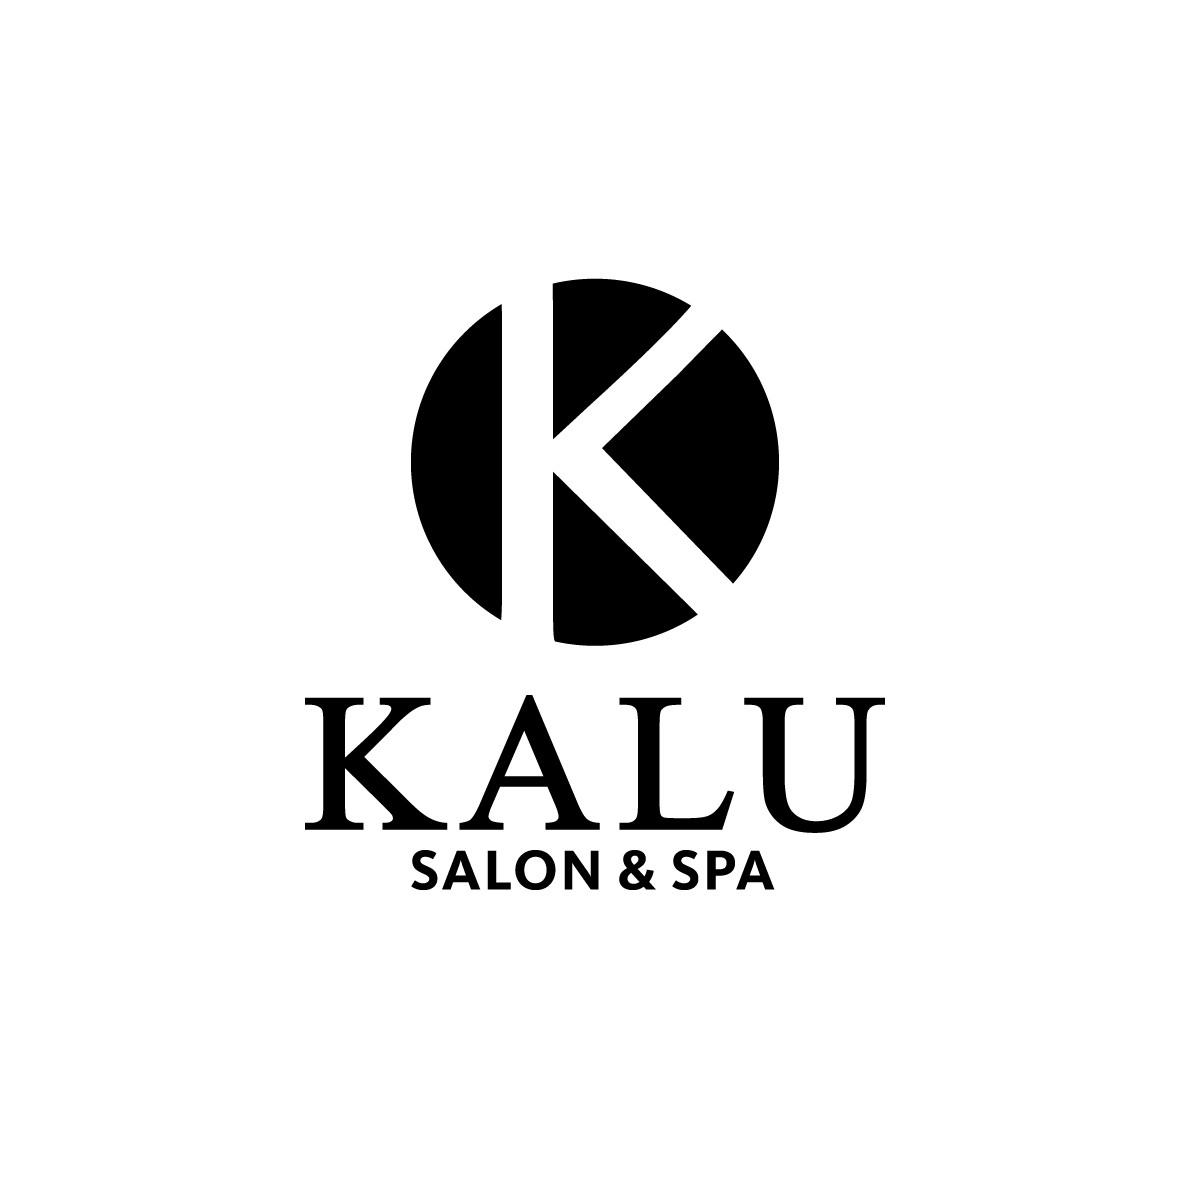 A new Vision KaLu Salon & Spa